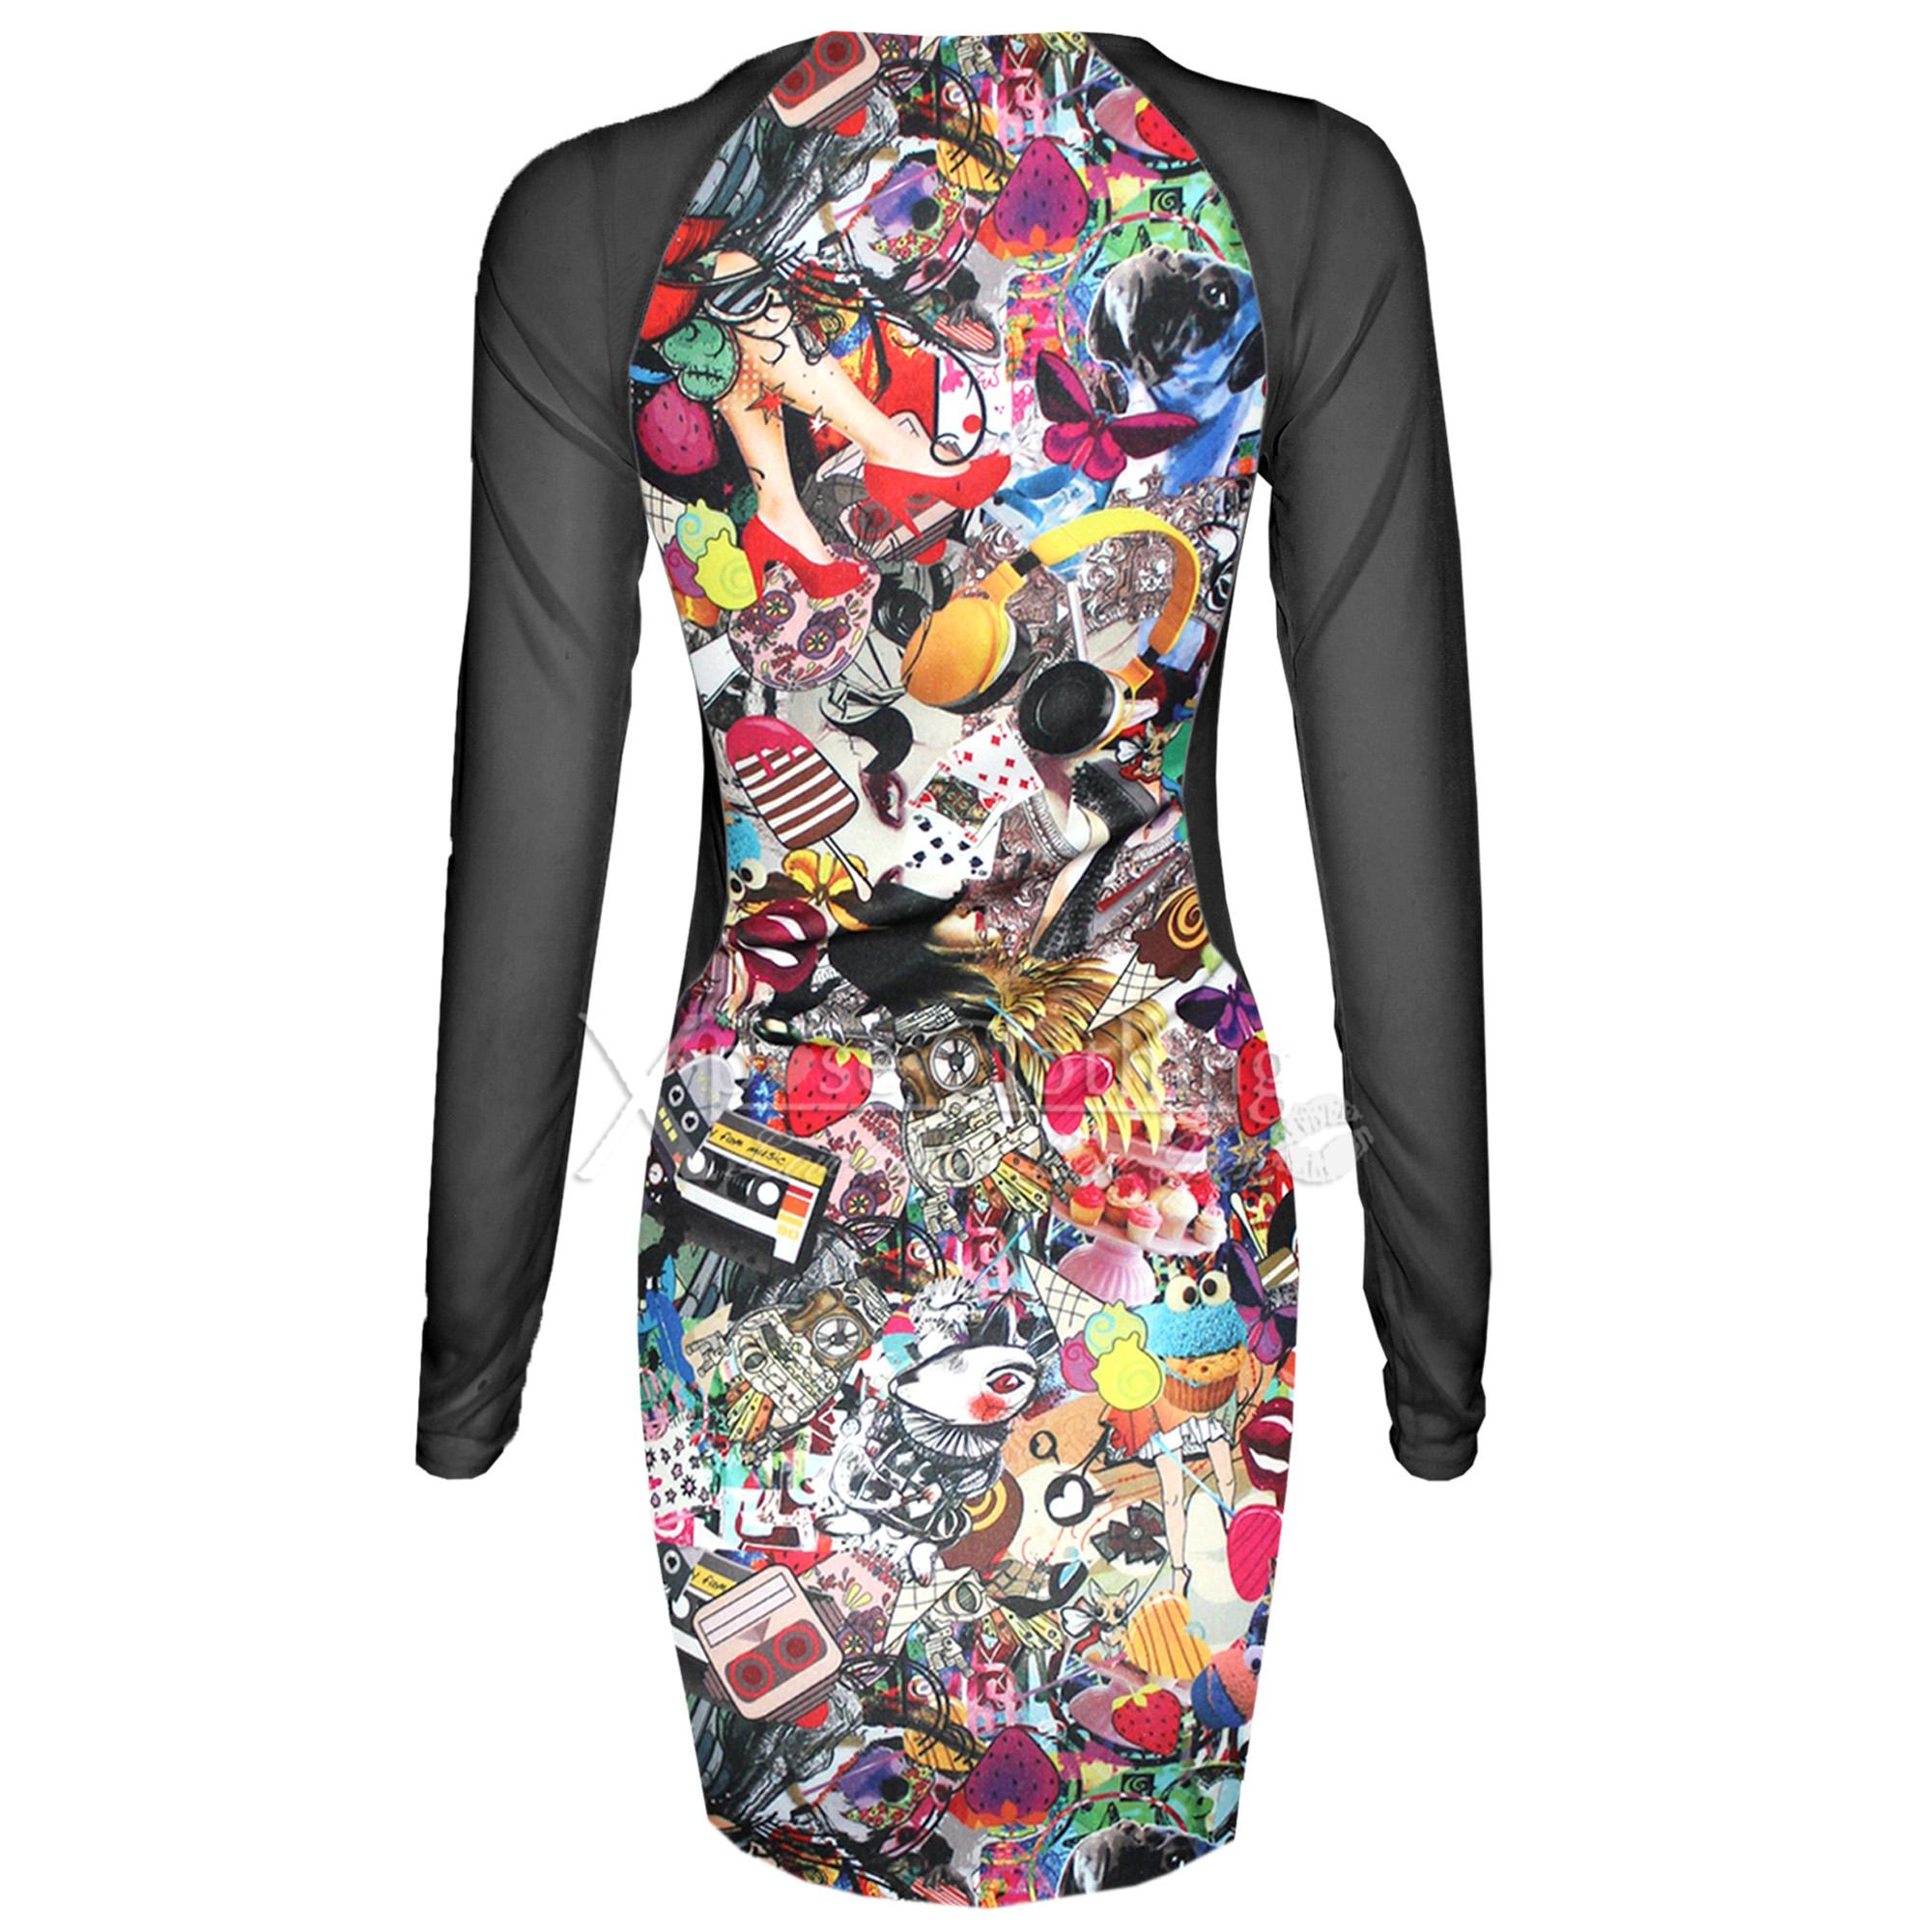 WOMENS LADIES FUNKY PRINT MESH SIDE MINI DRESSES SLIMMING EFFECT ...